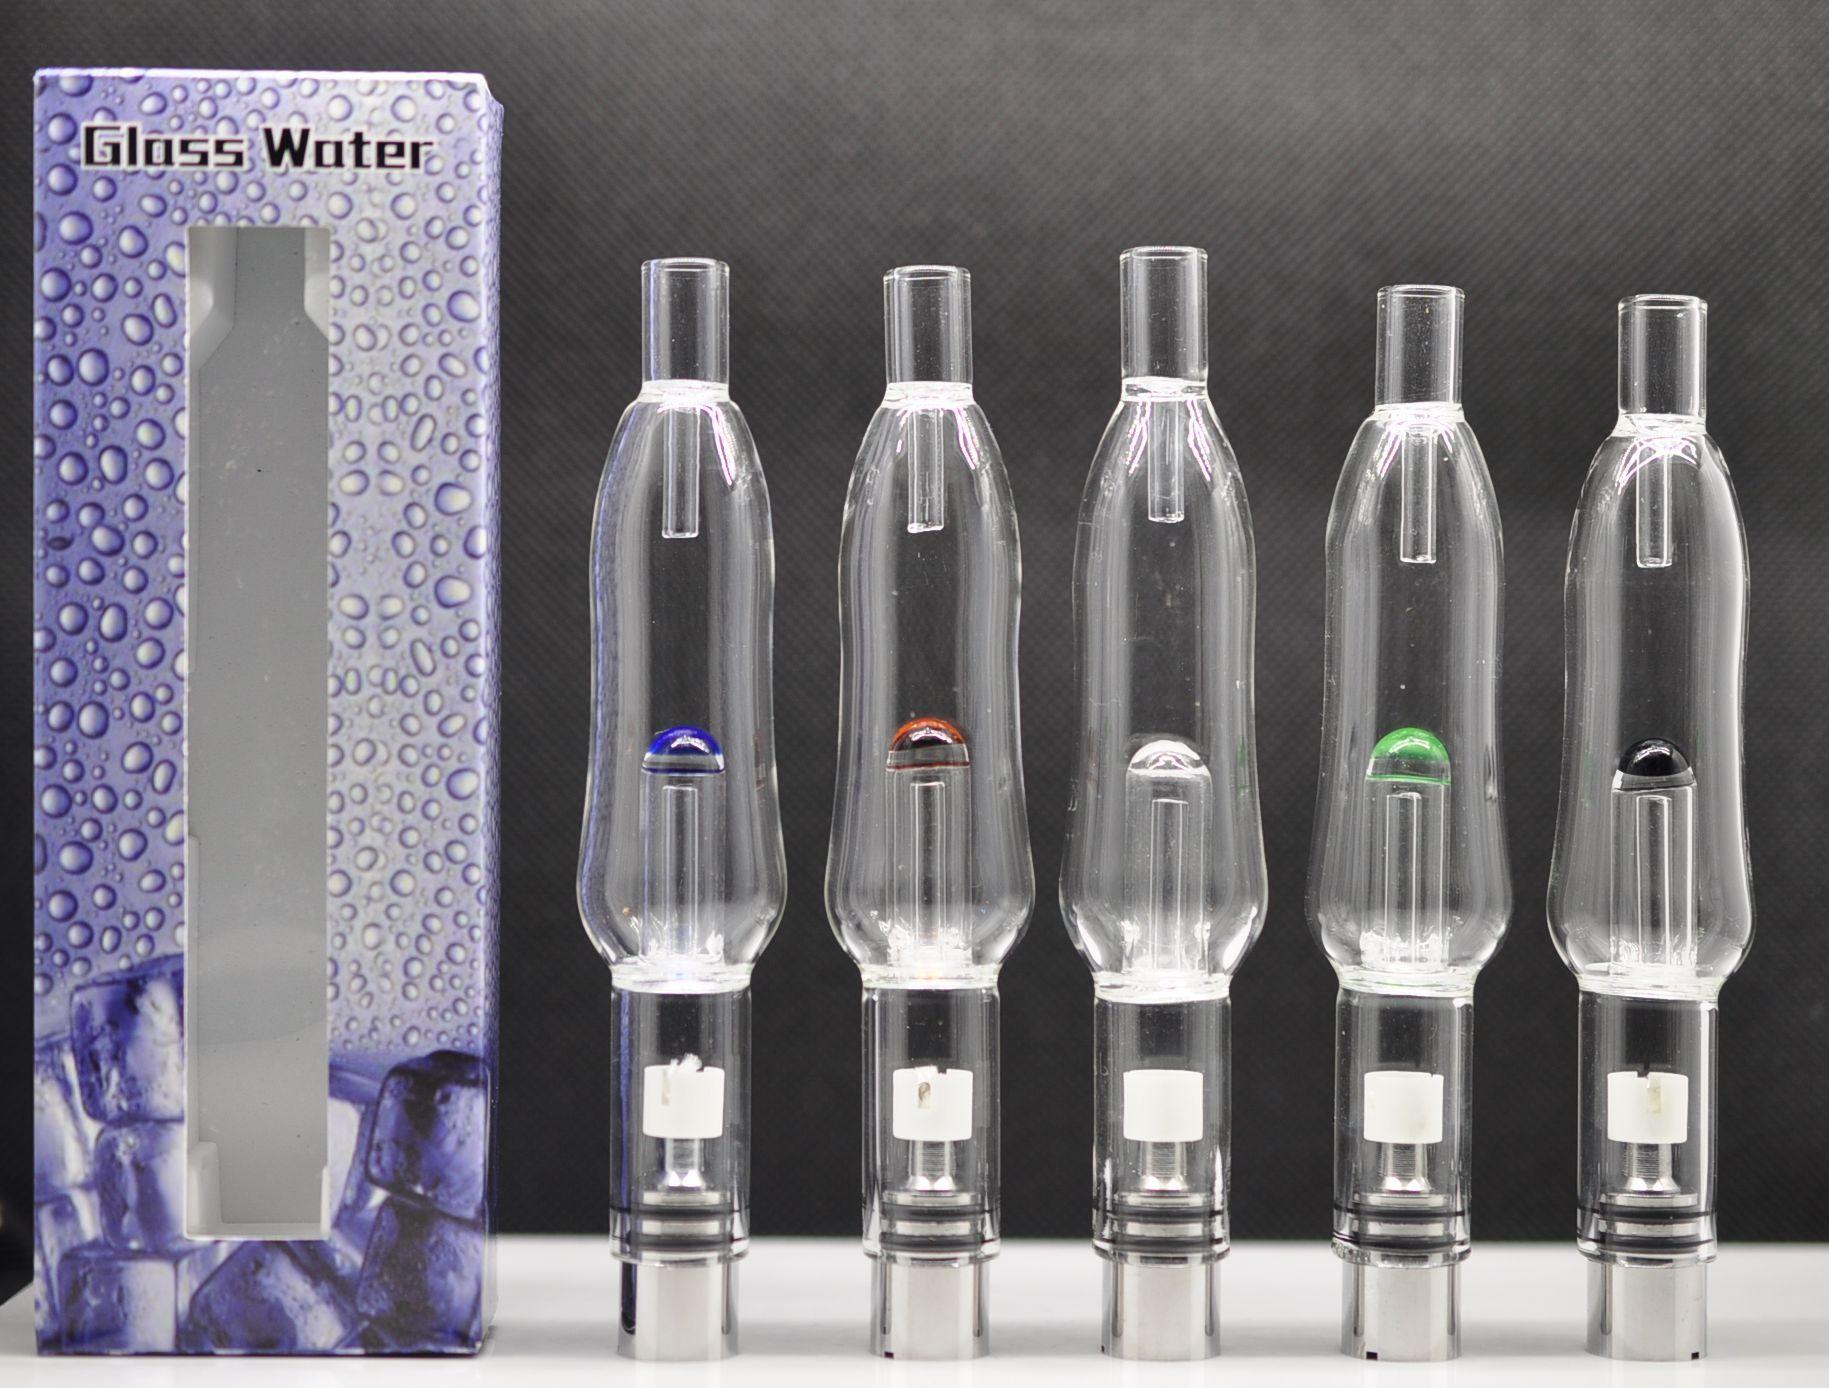 2016 New Glass Water Aqua Bubbler Silver Atomizer hookah shisha bong Tank 510 Thread Vaporizer Pen Dry Herb Wax Extra 2 Coils